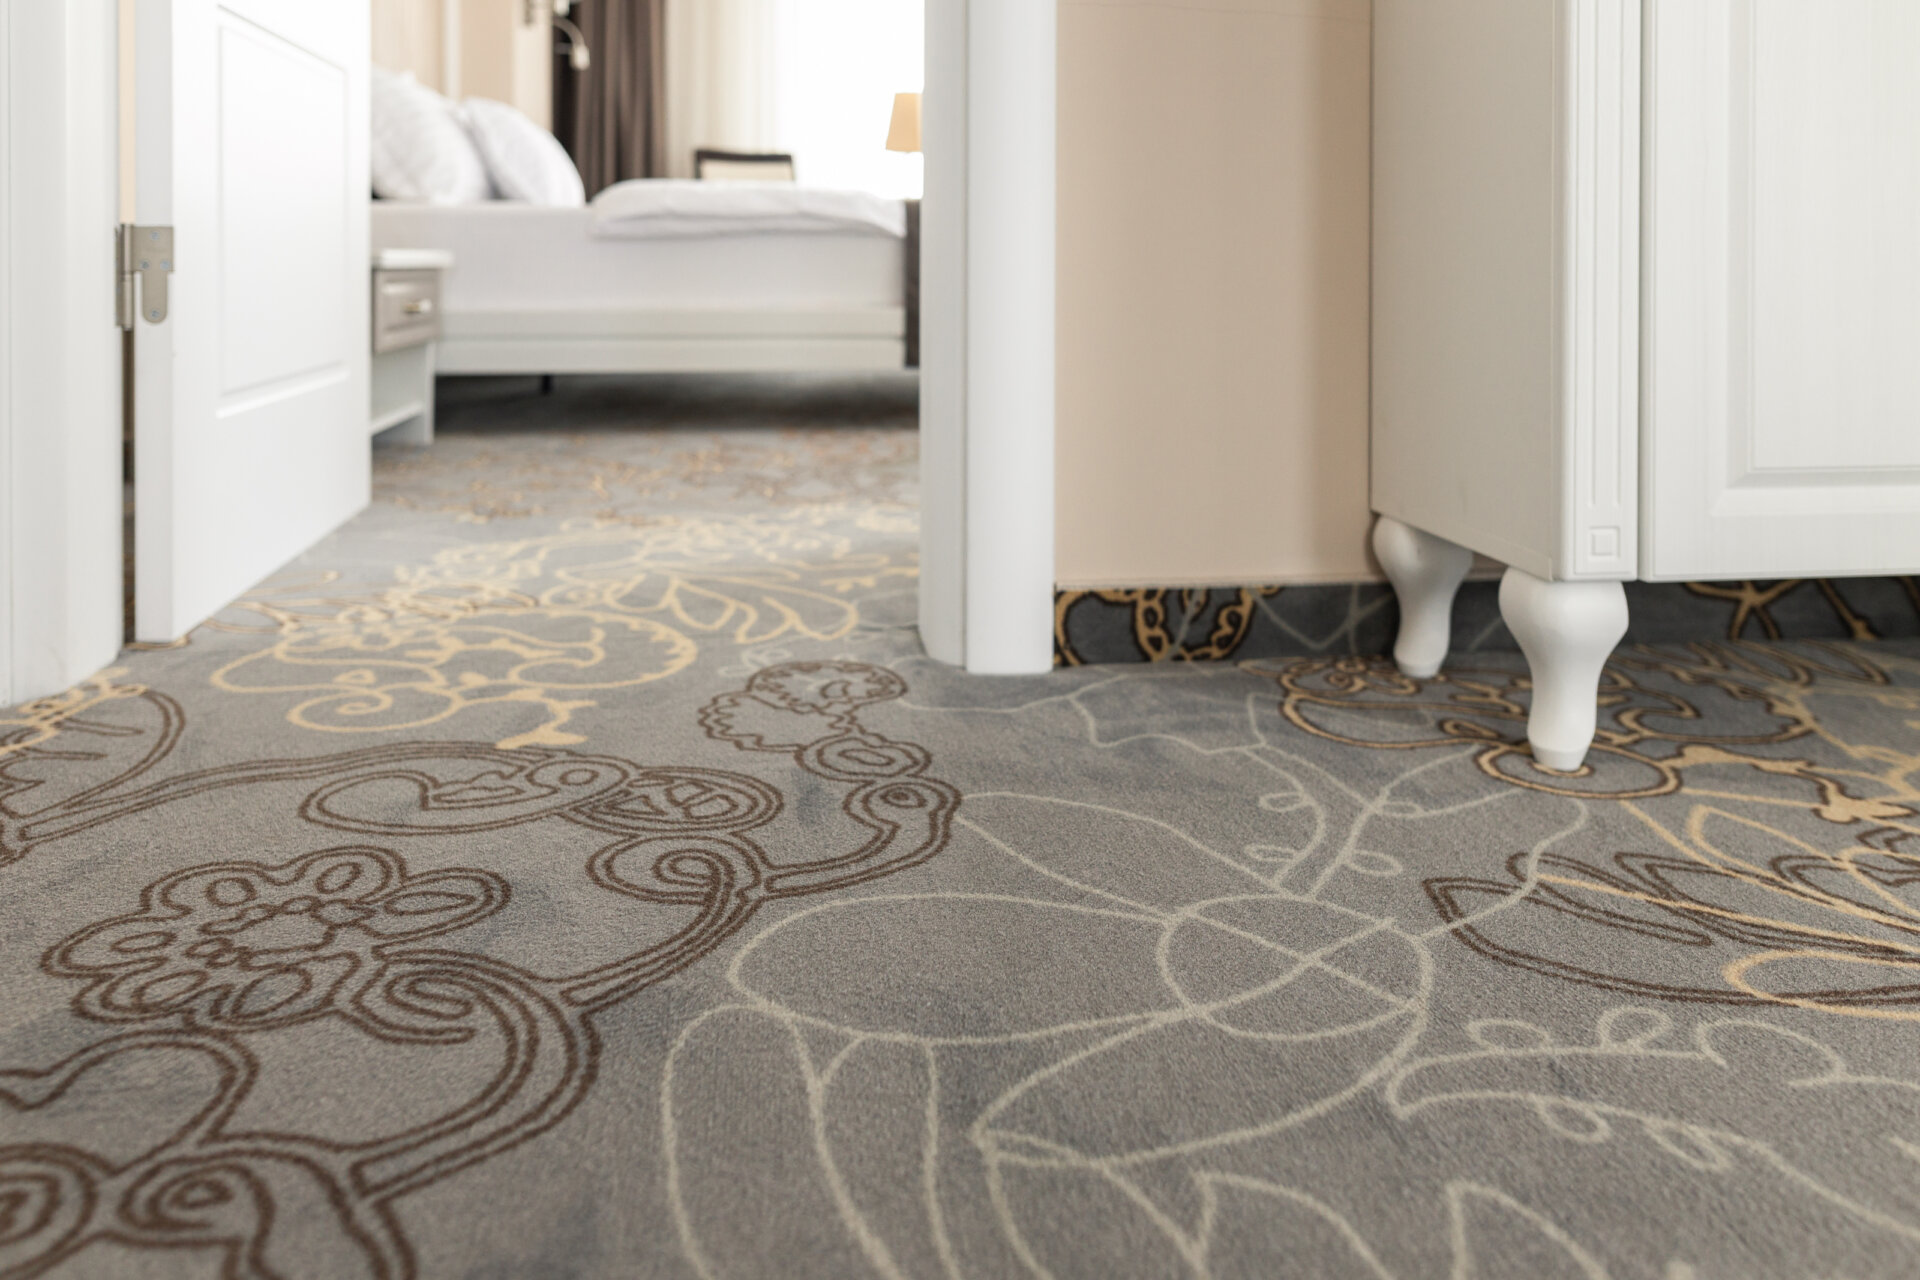 20210524-carpet&more-mamaia-hotel-scapino-junior-by-hugmedia-037